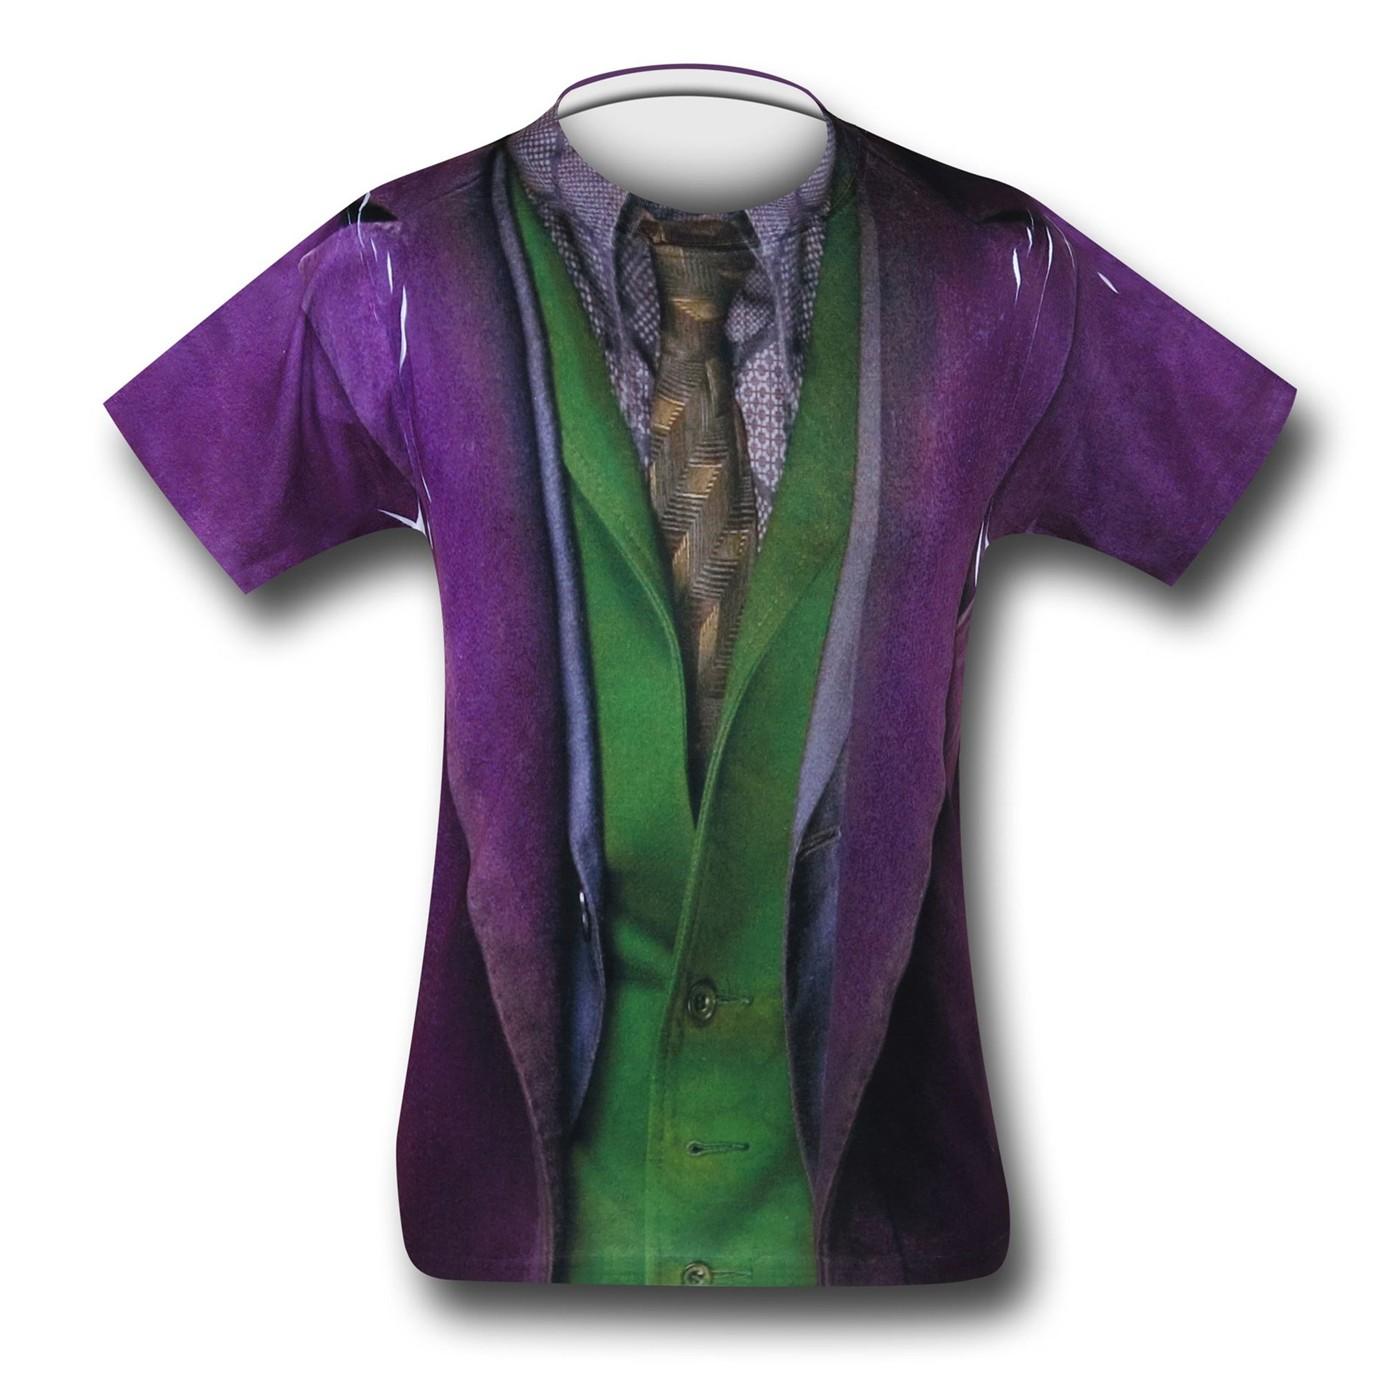 Joker Dark Knight Sublimated Costume T-Shirt